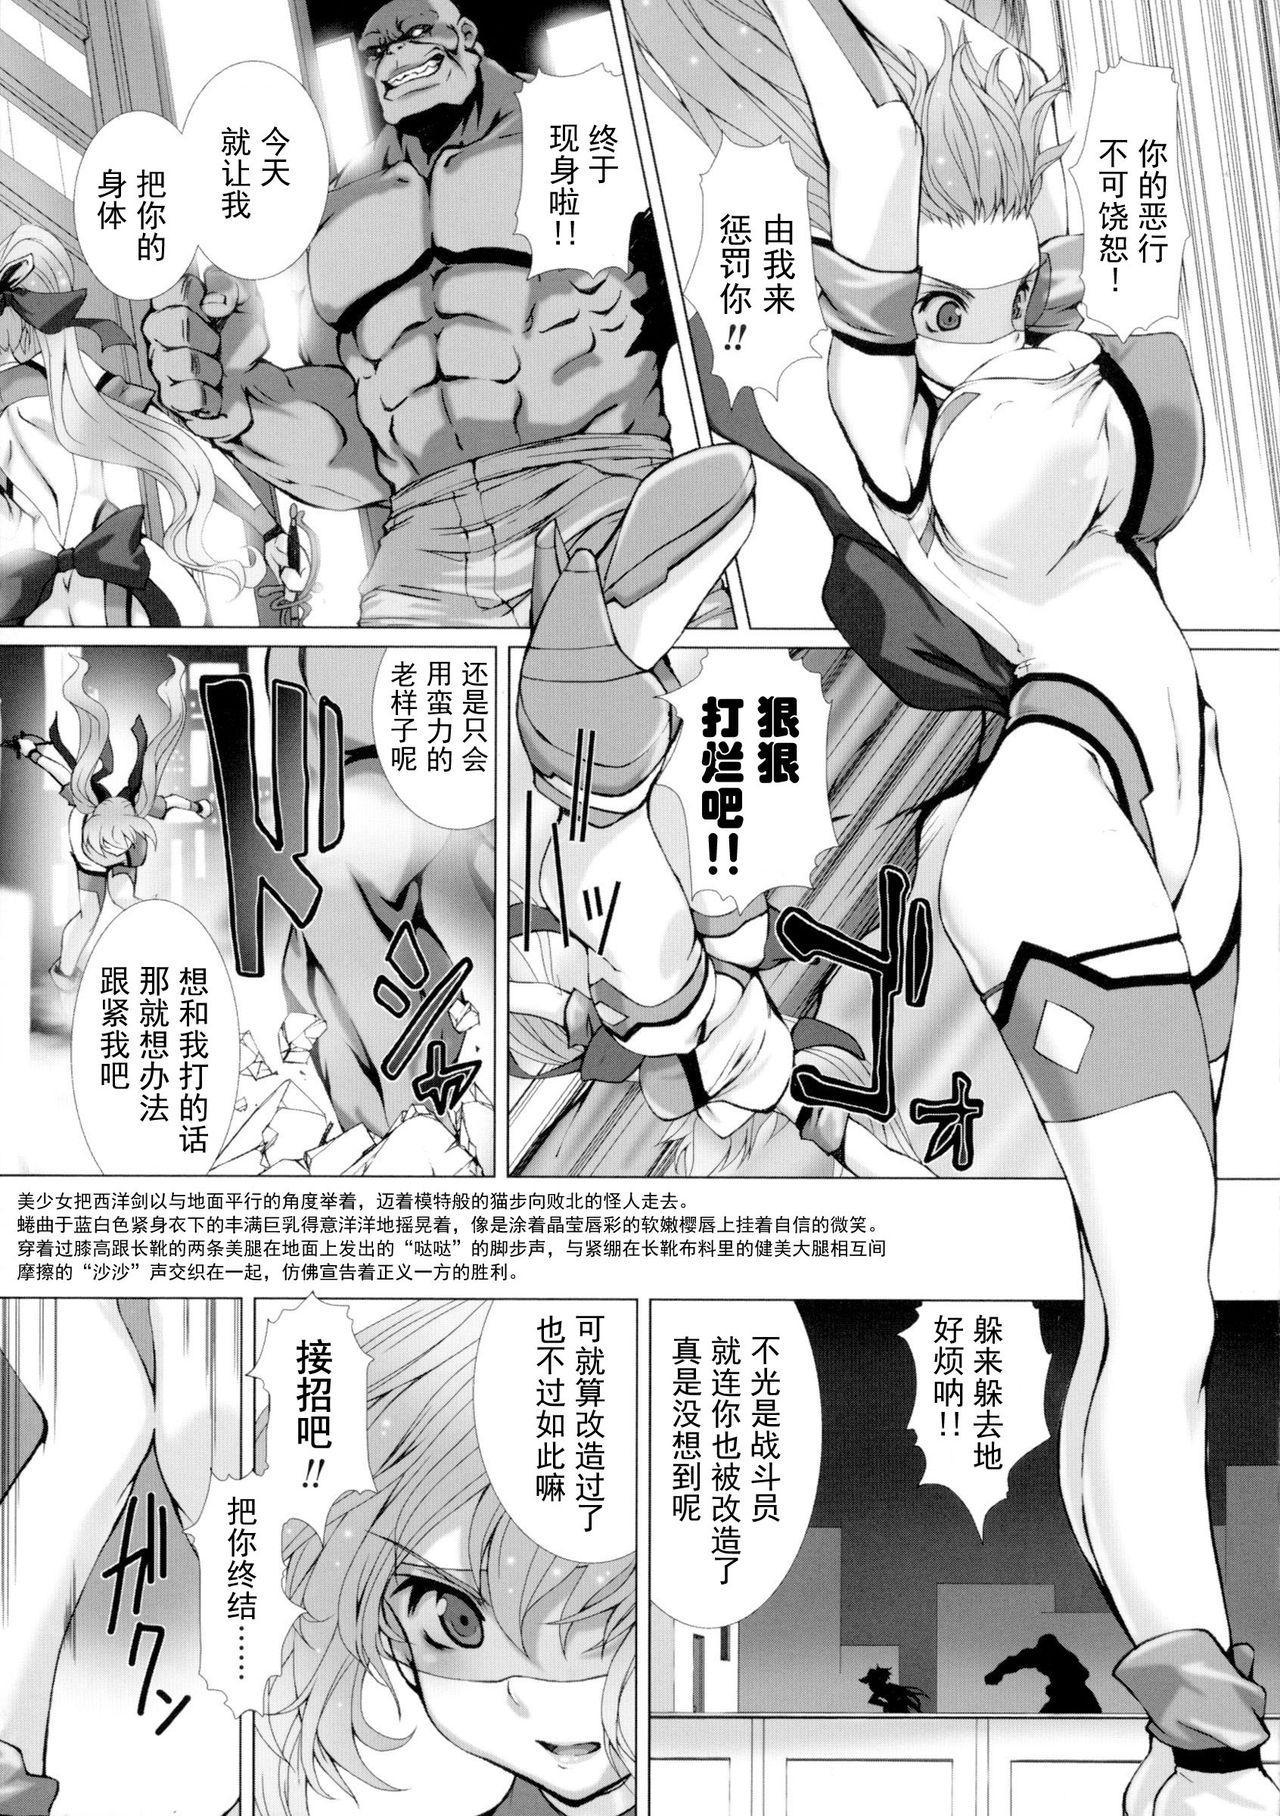 Hengen Souki Shine Mirage THE COMIC EPISODE 1-5 29